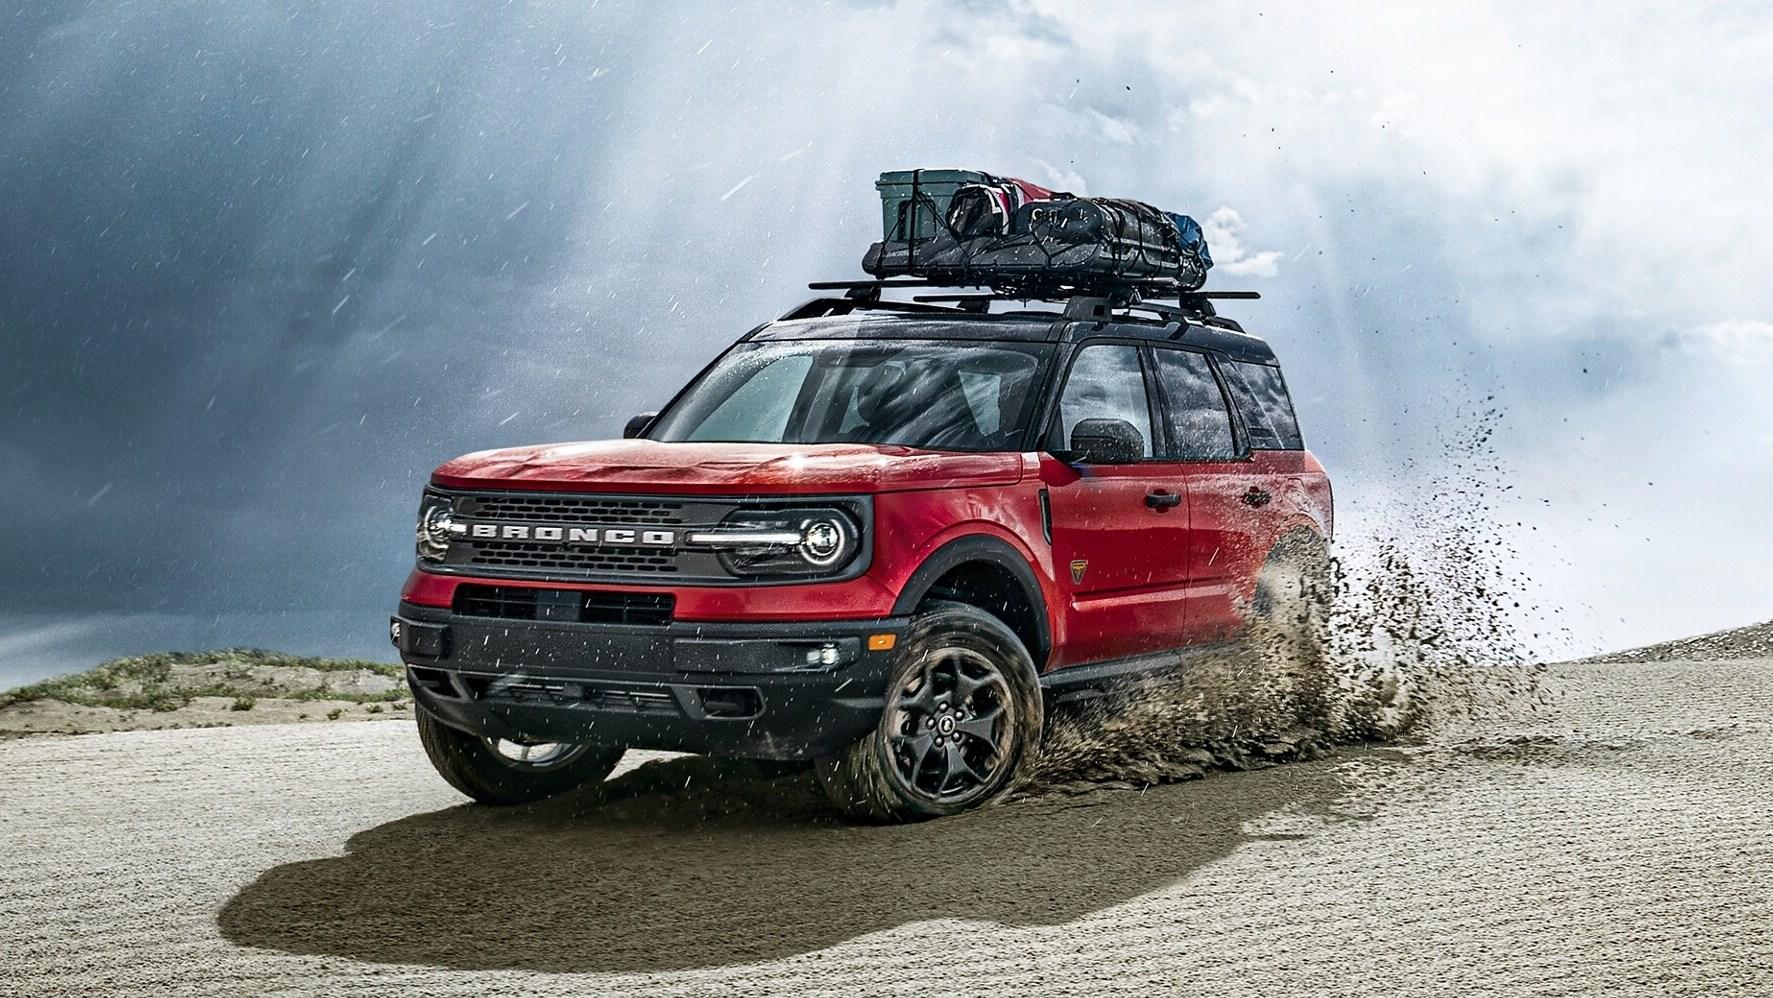 Ford Bronco Badlands 2.0 turbo AT 2022 (1)